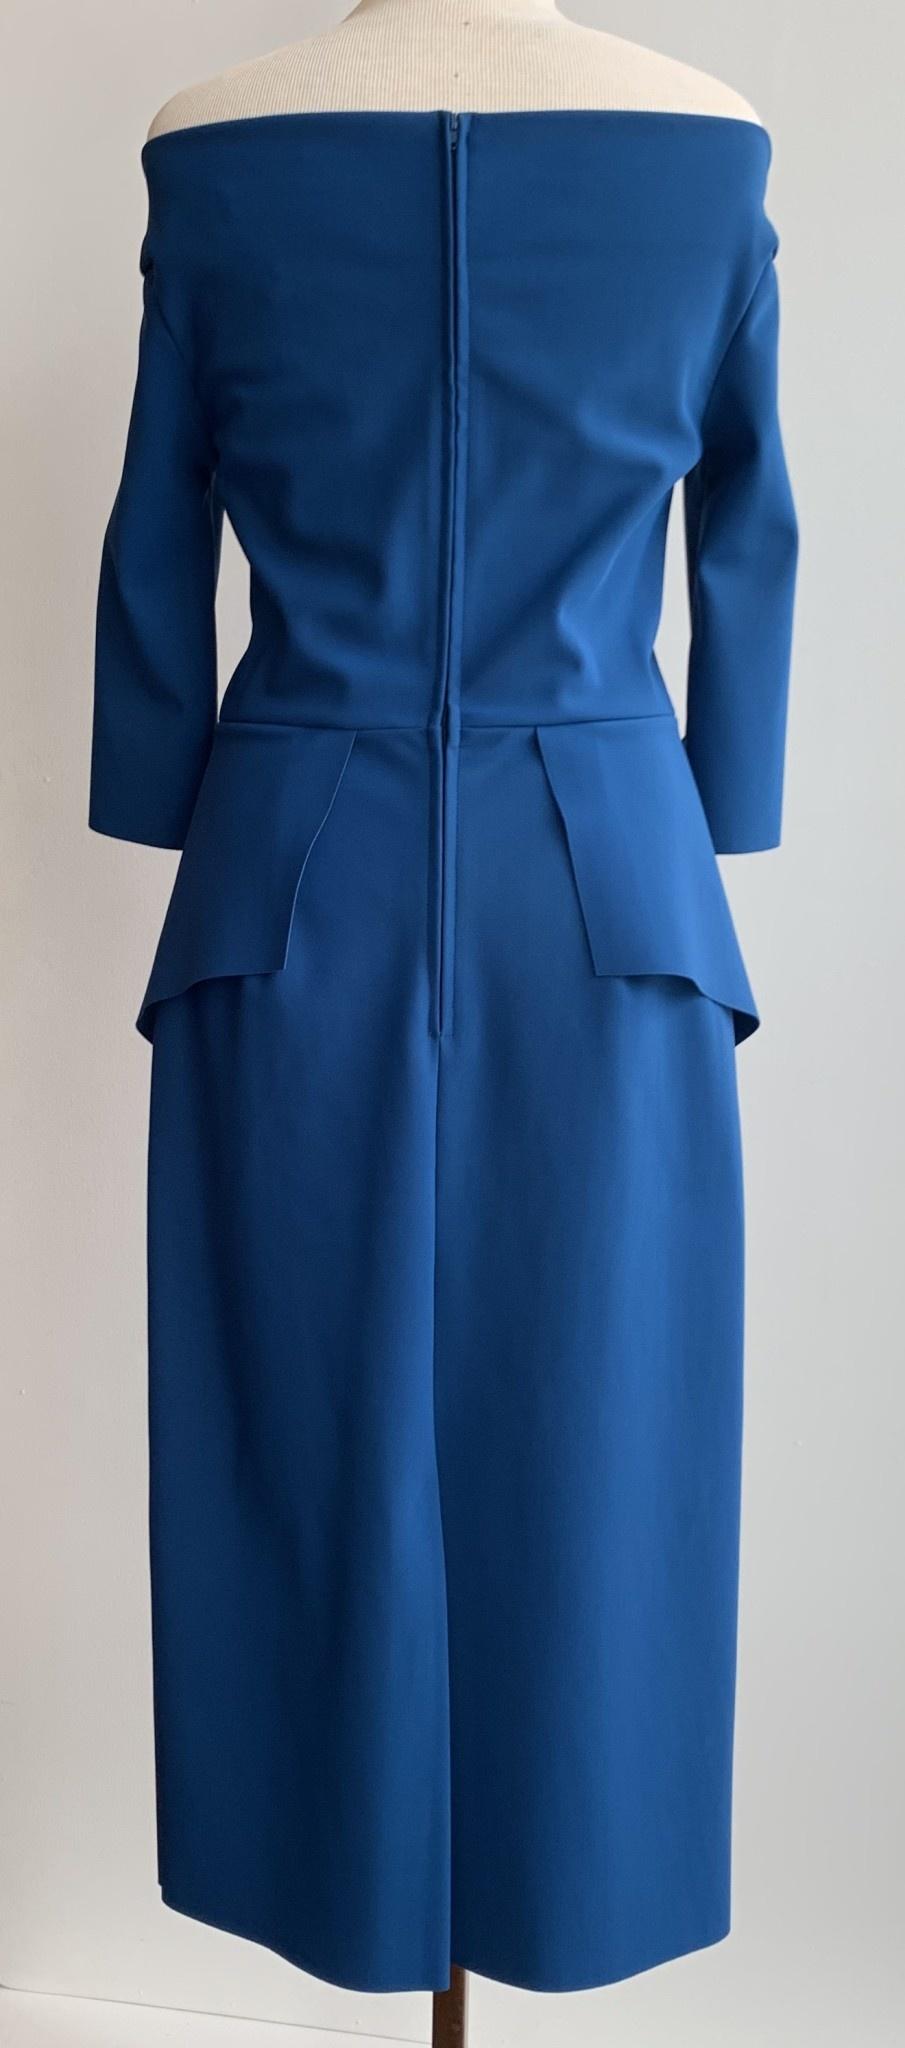 Greta Constantine Edwina Peplum Dress